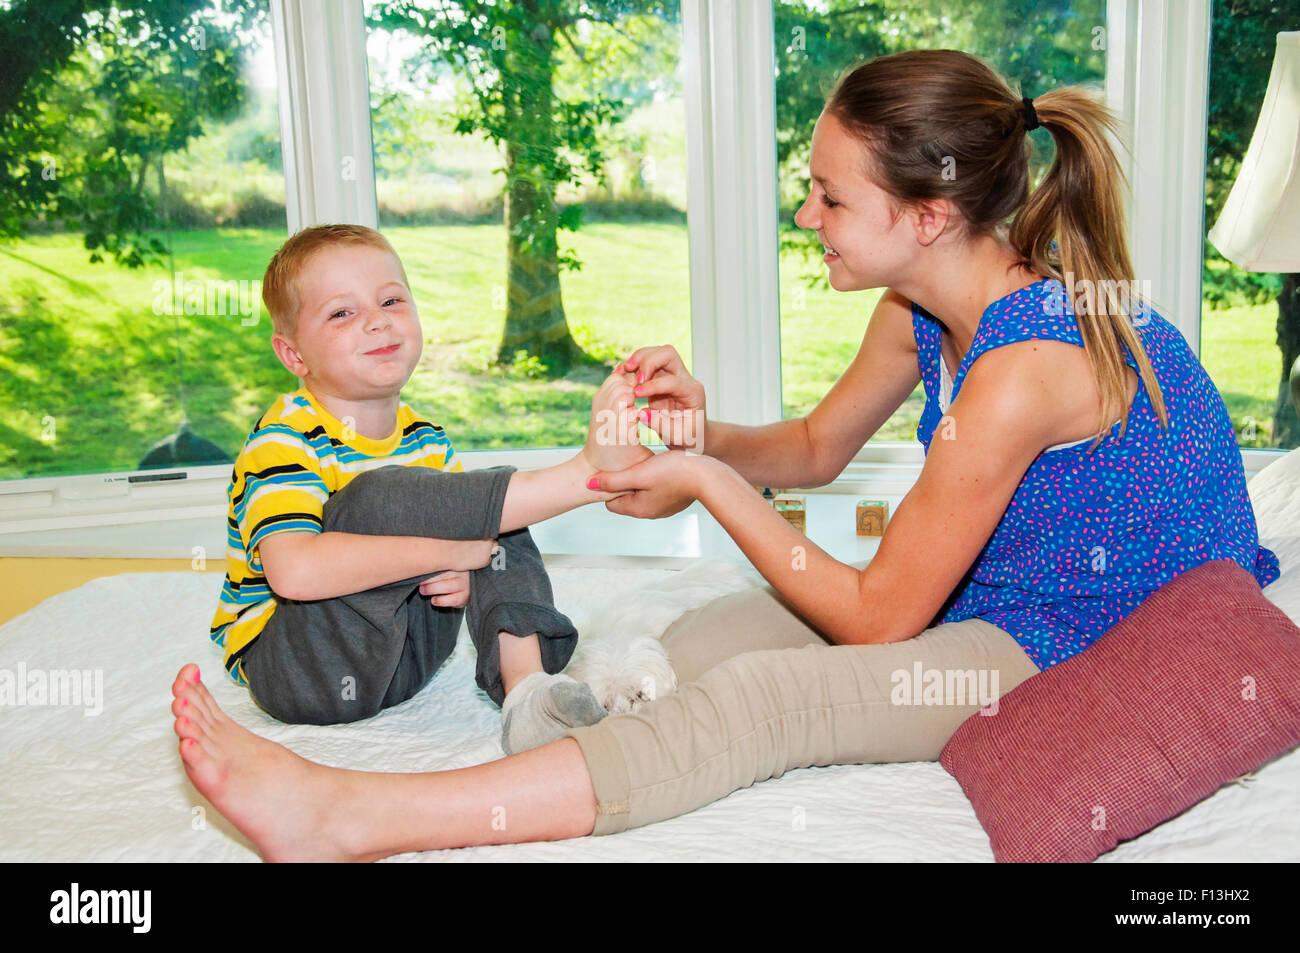 Samus Feet Tickle: Two Children Tickling Feet Stock Photo: 86746410